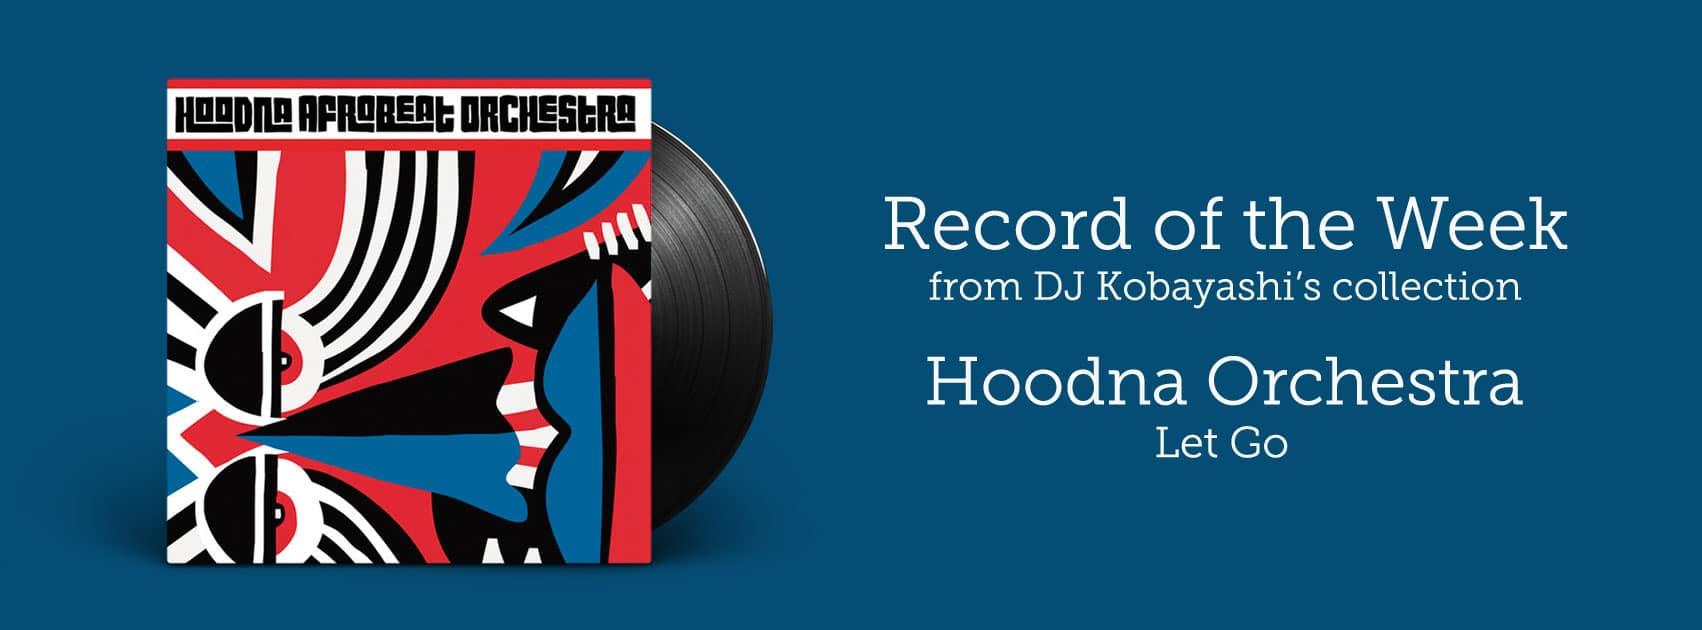 Hoodna Orchestra - Let Go